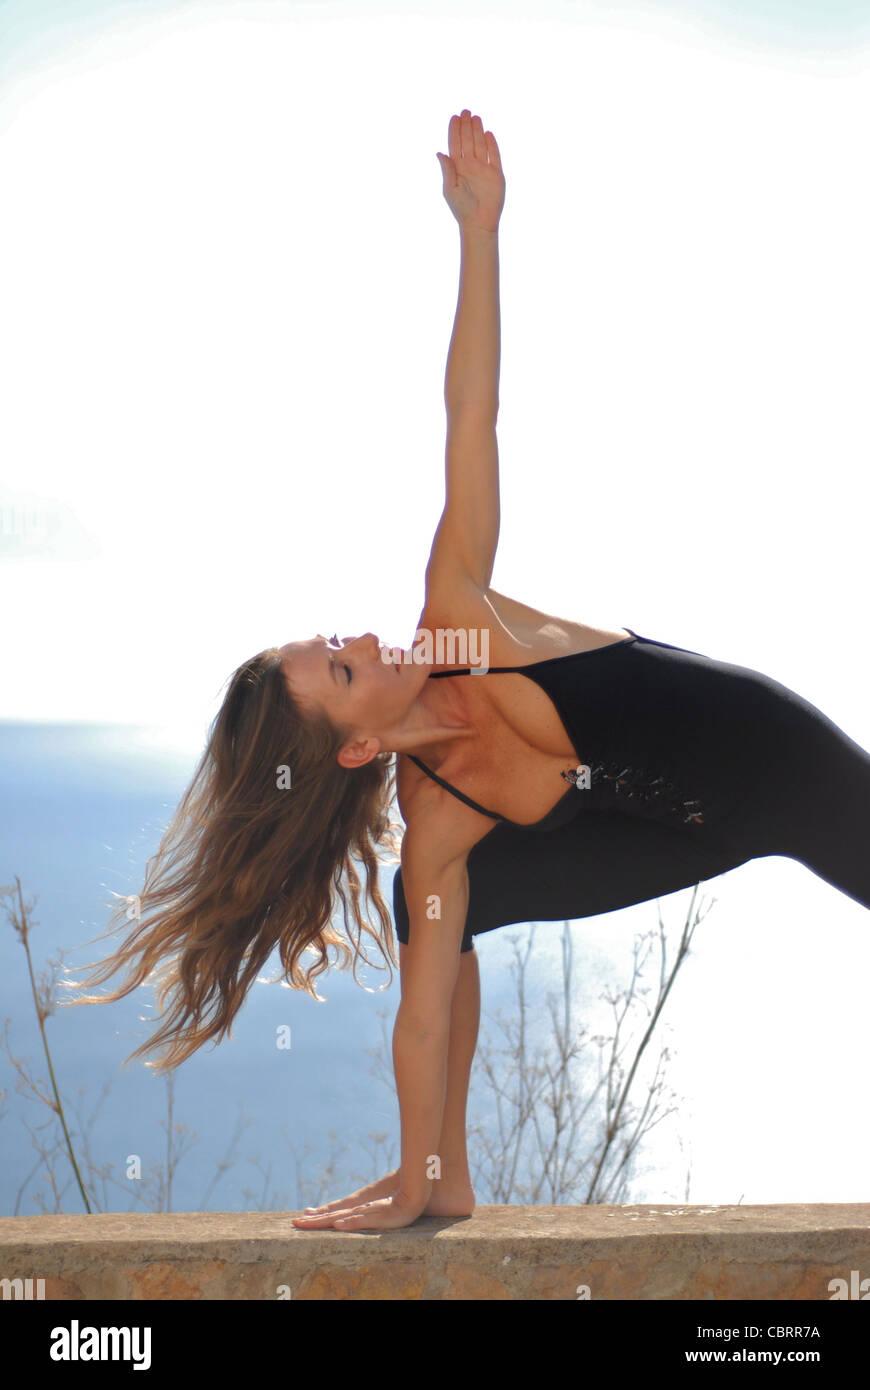 Shiromani Yoga Lena Tancredi, faisant du yoga dans la nature, à Ibiza, Espagne - Photo de Nano Calvo Photo Stock